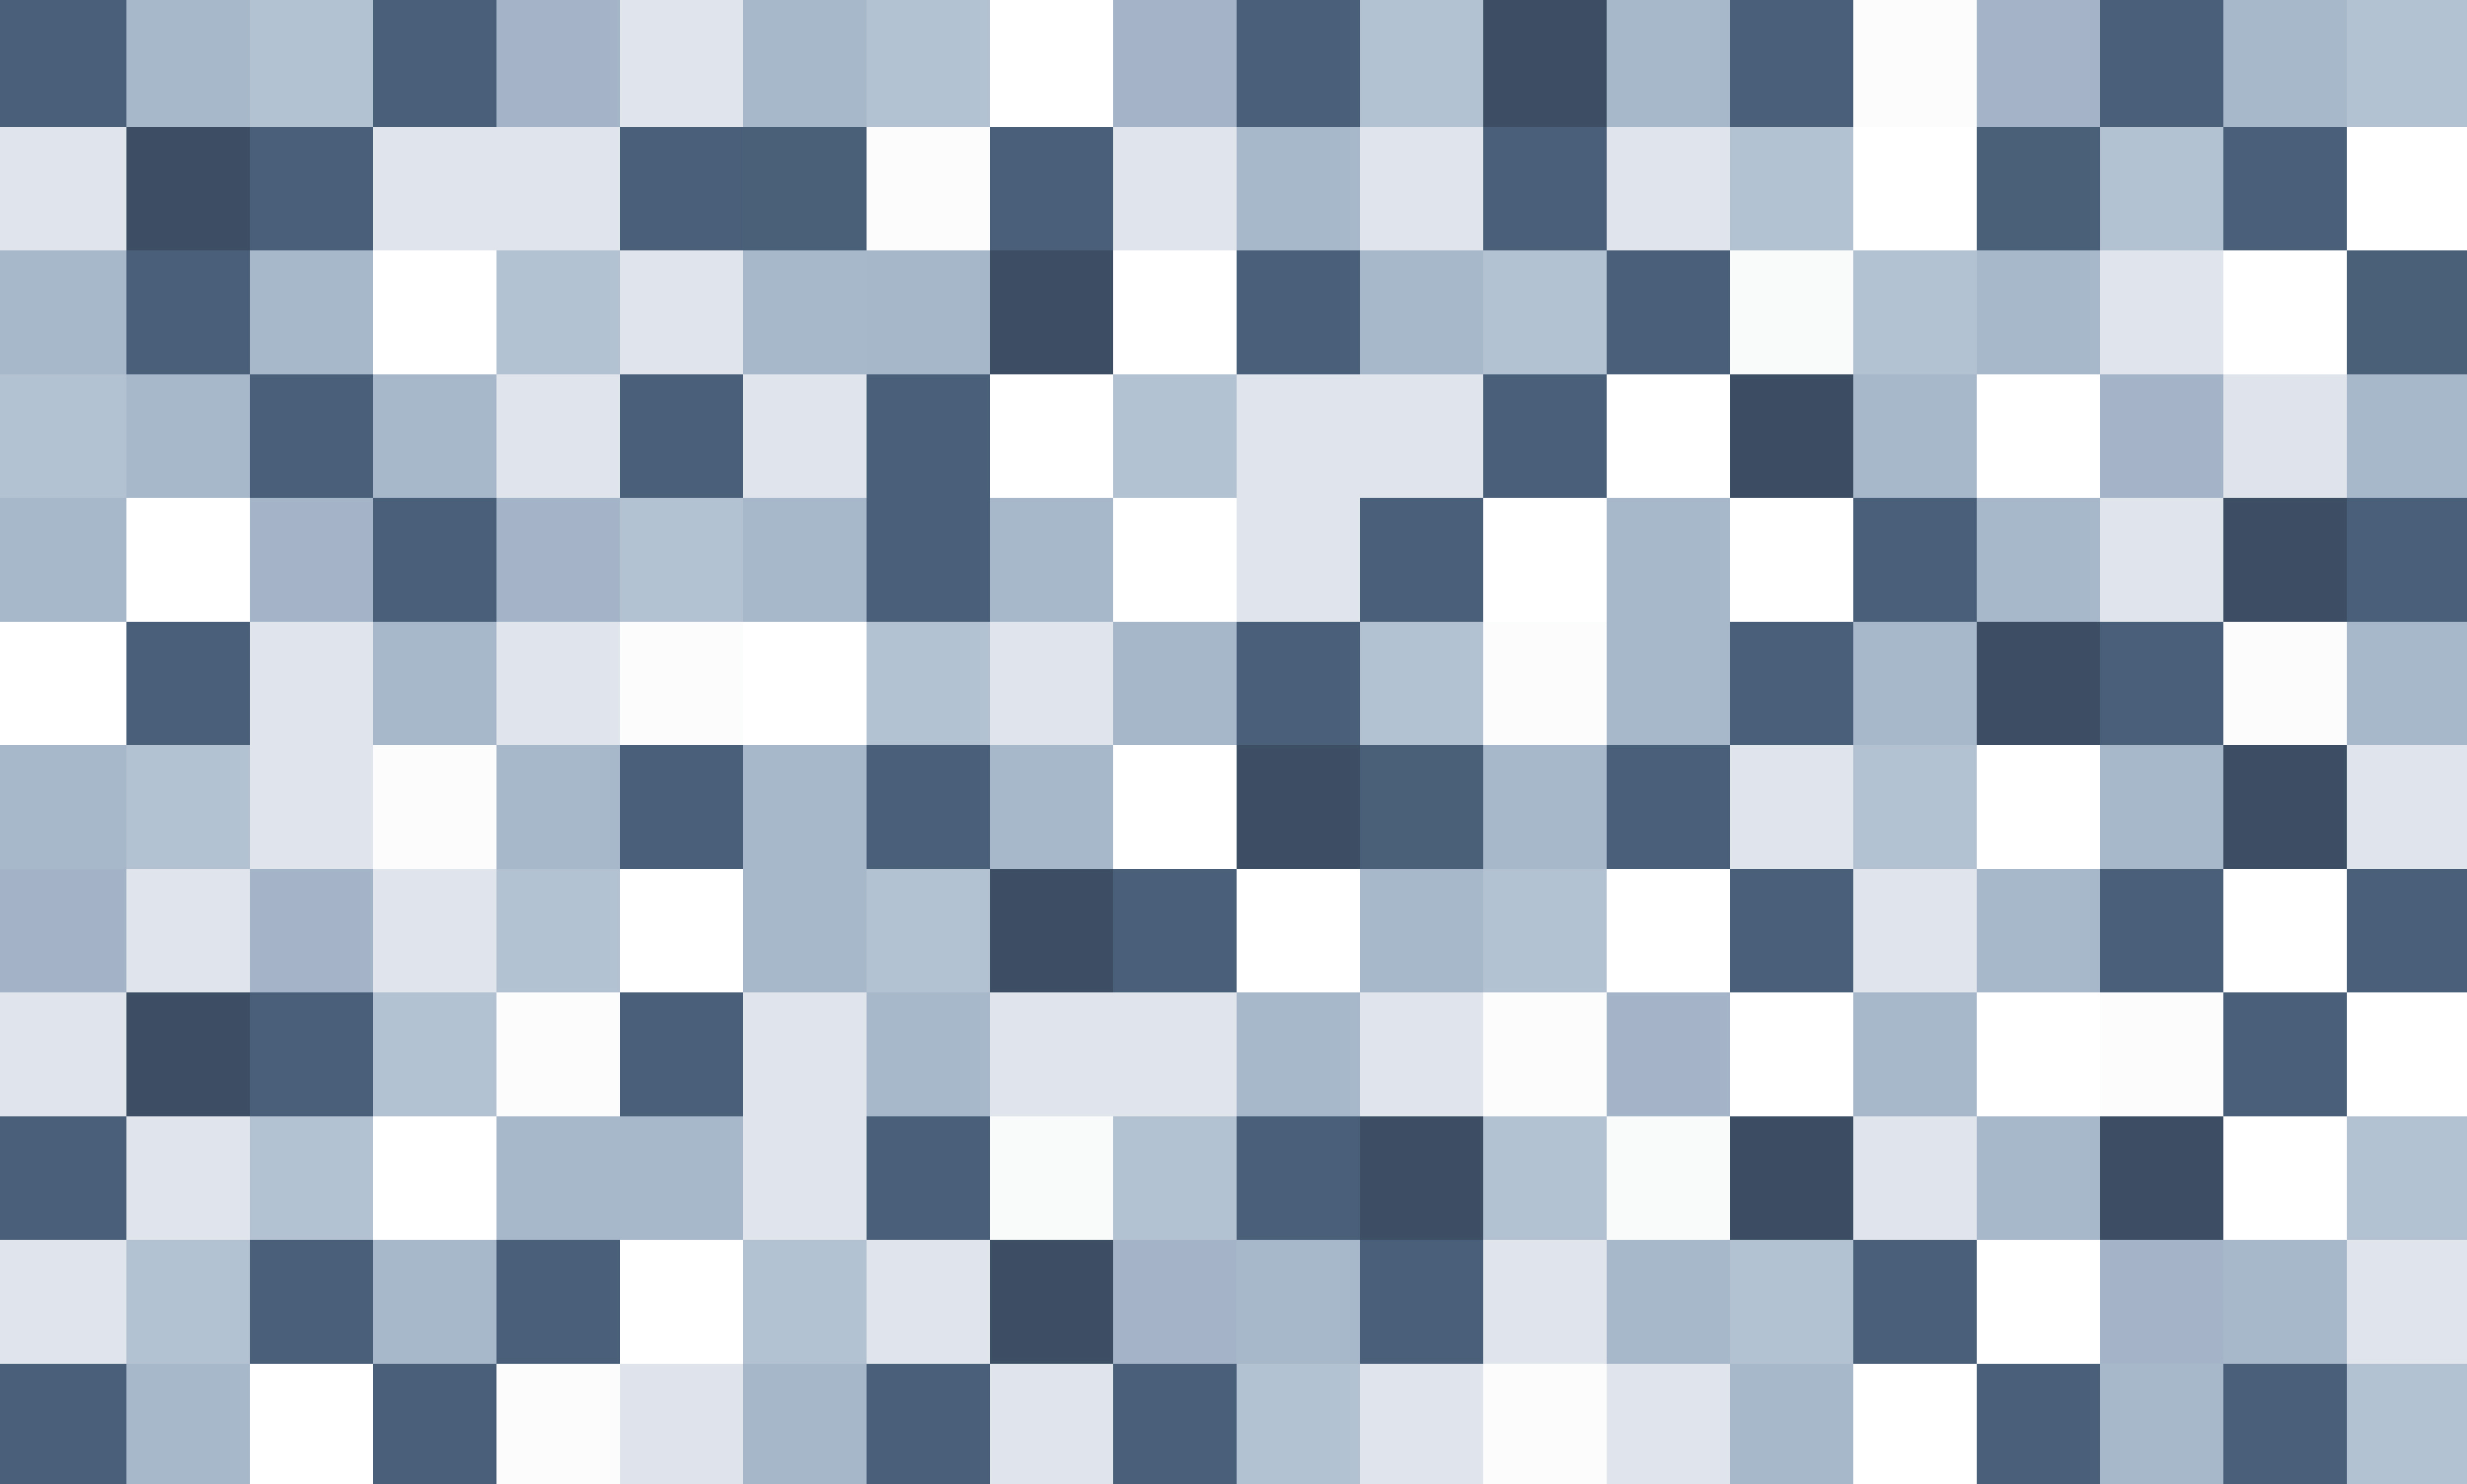 Matrix 3d Wallpaper Free Download Free Stock Photo 1540 Grey Squares Freeimageslive